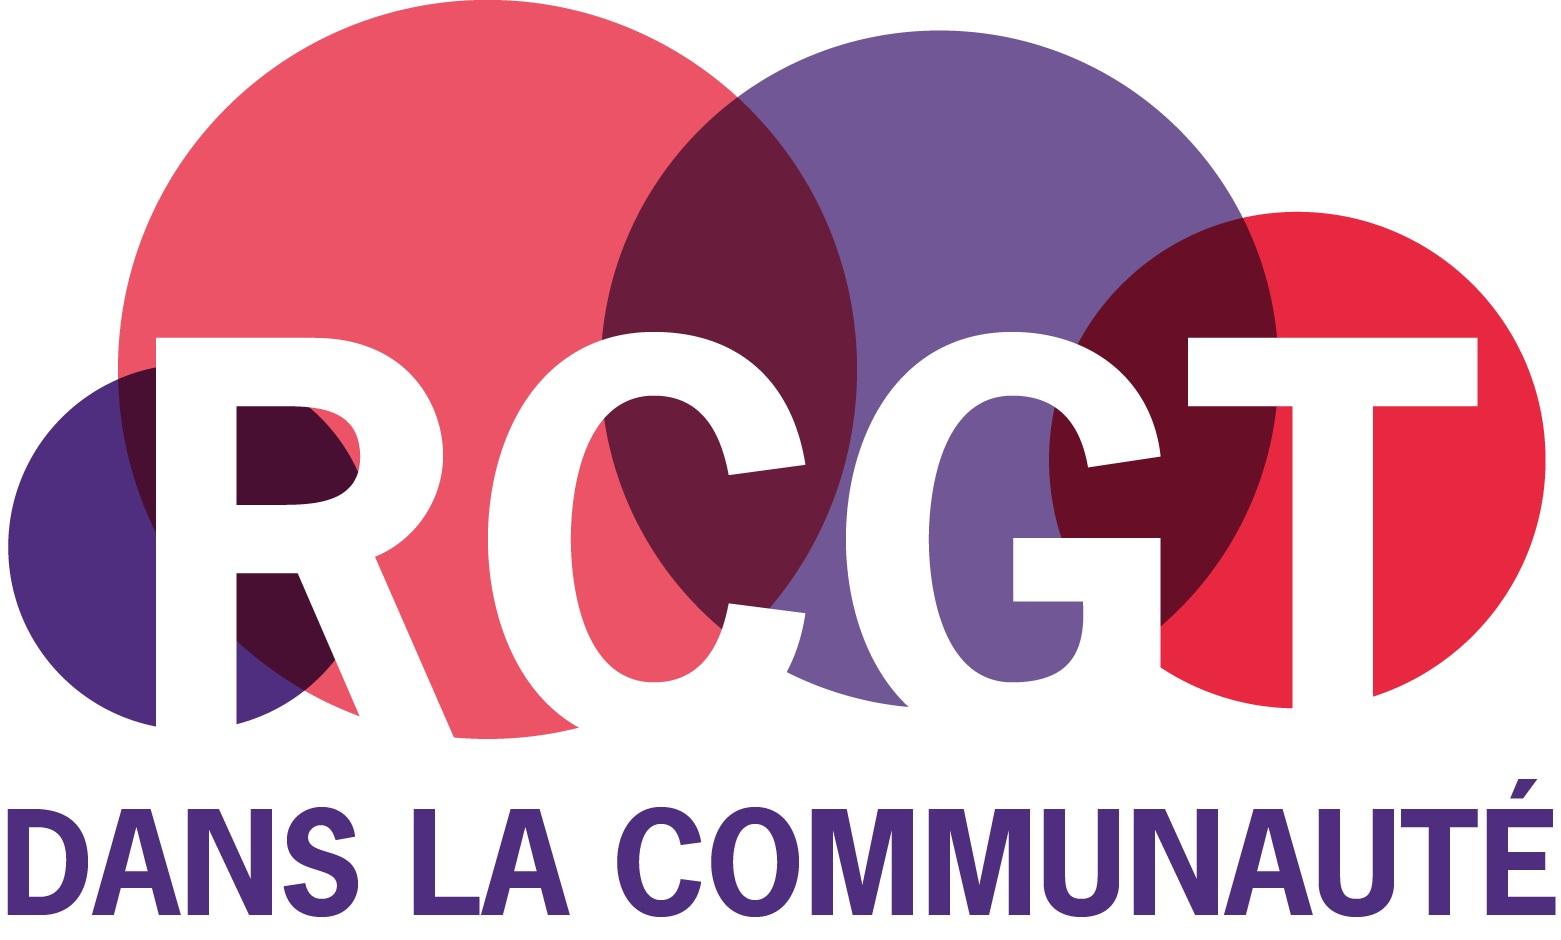 RCGT+dans+la+communaut%C3%A9+2017_RGB.jpg